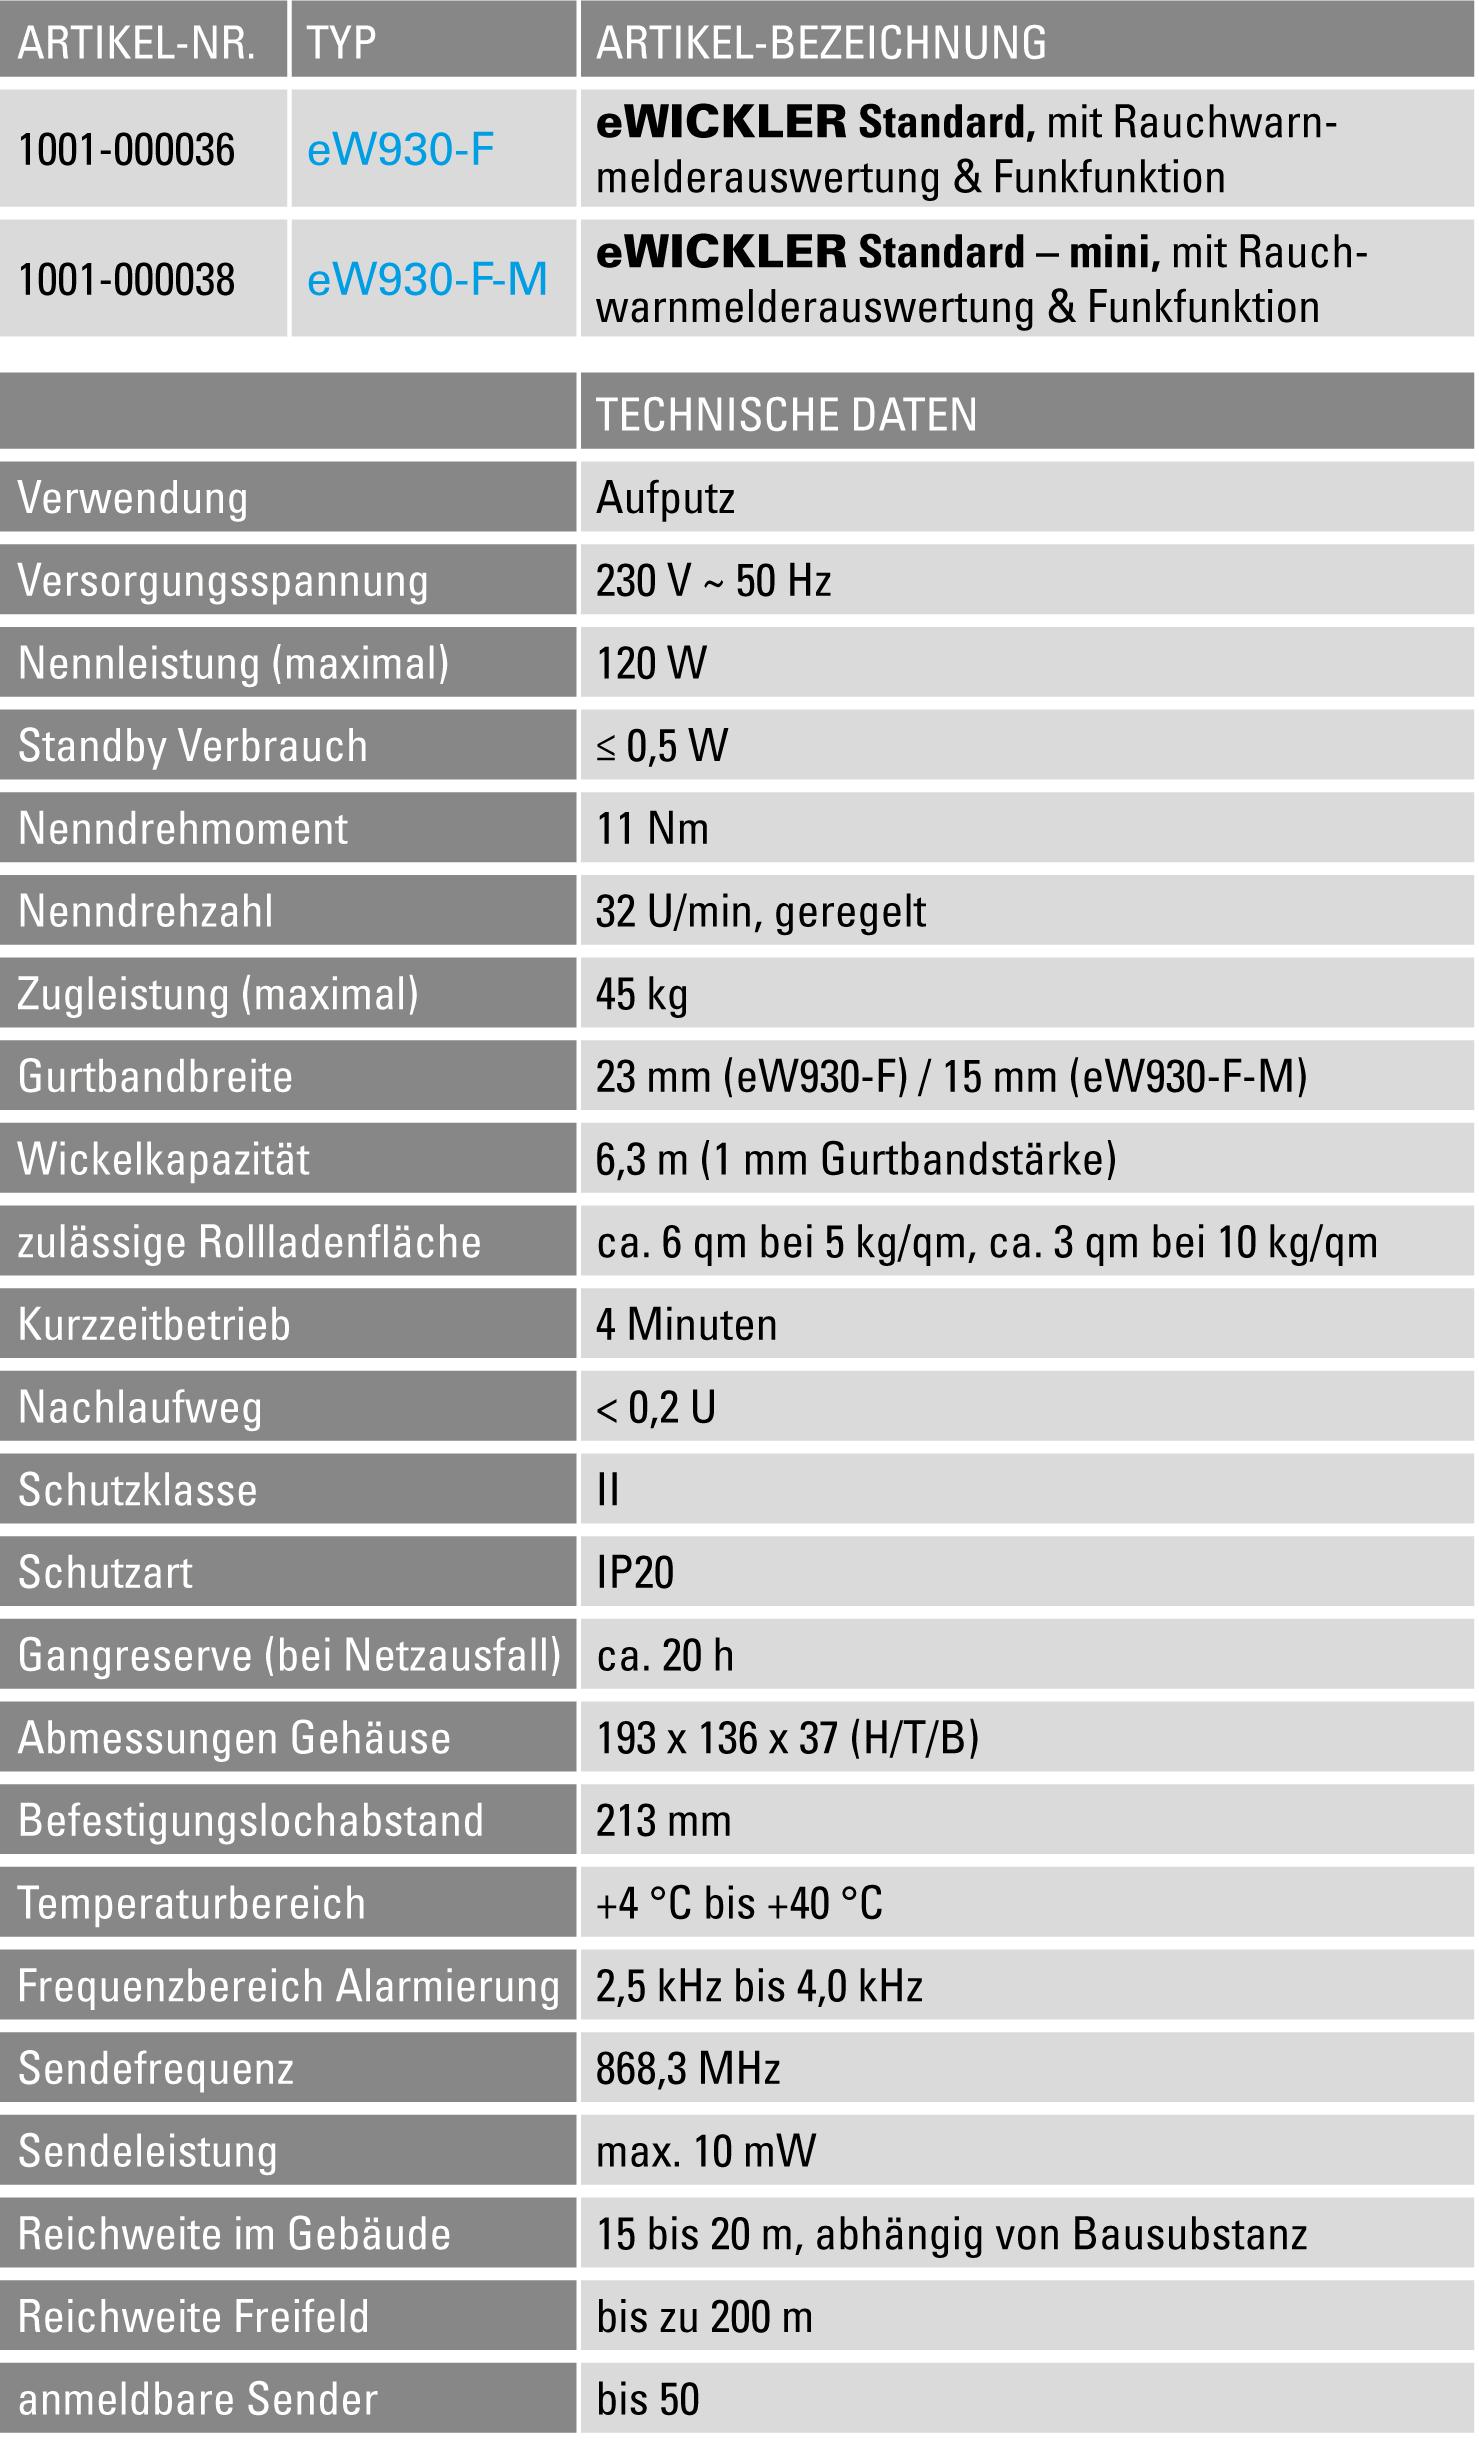 ew930-F-Technische-Daten